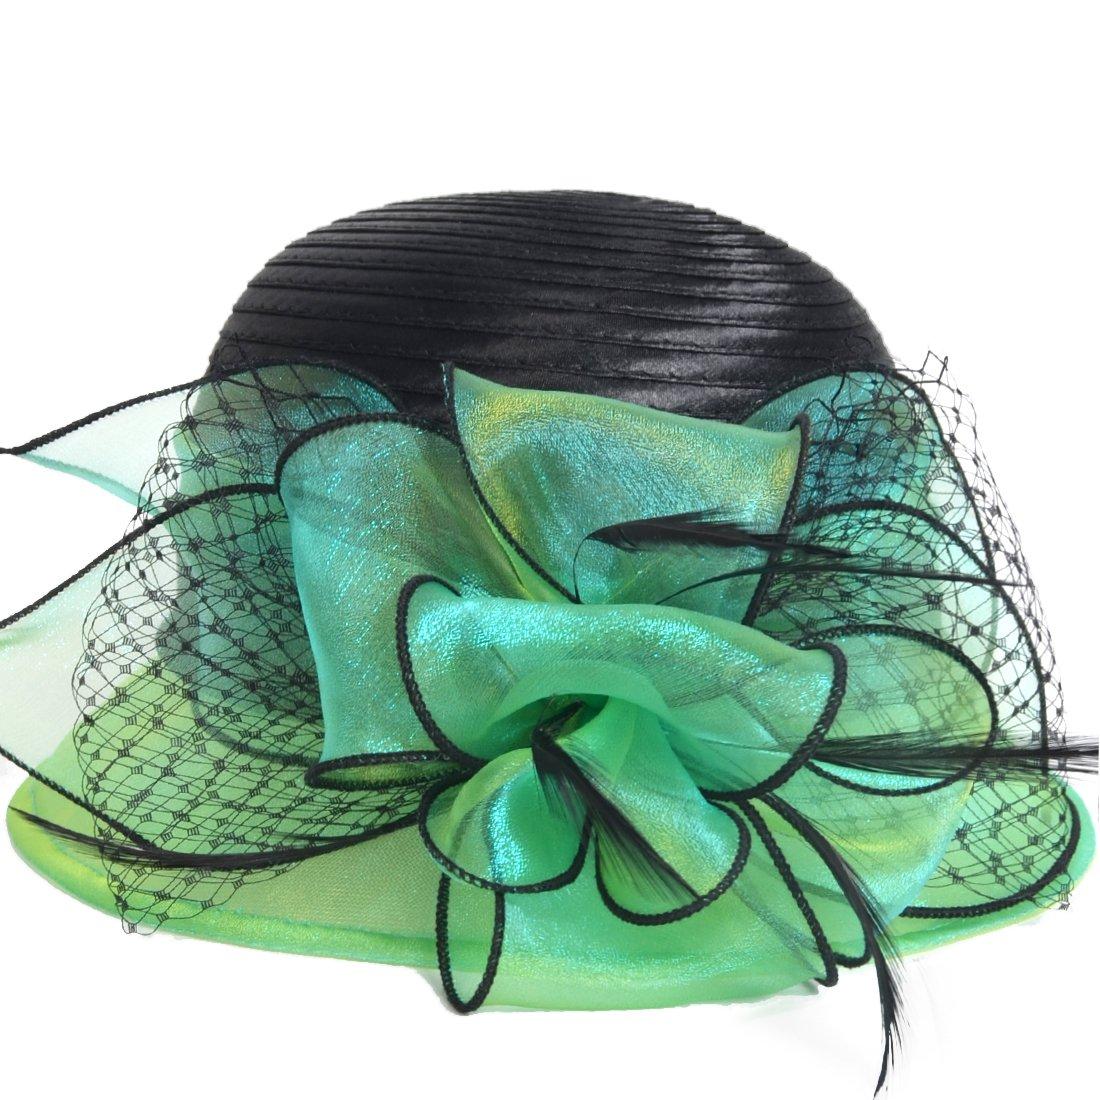 Kentucky Derby Dress Church Cloche Hat Sweet Cute Floral Bucket Hat (Green)